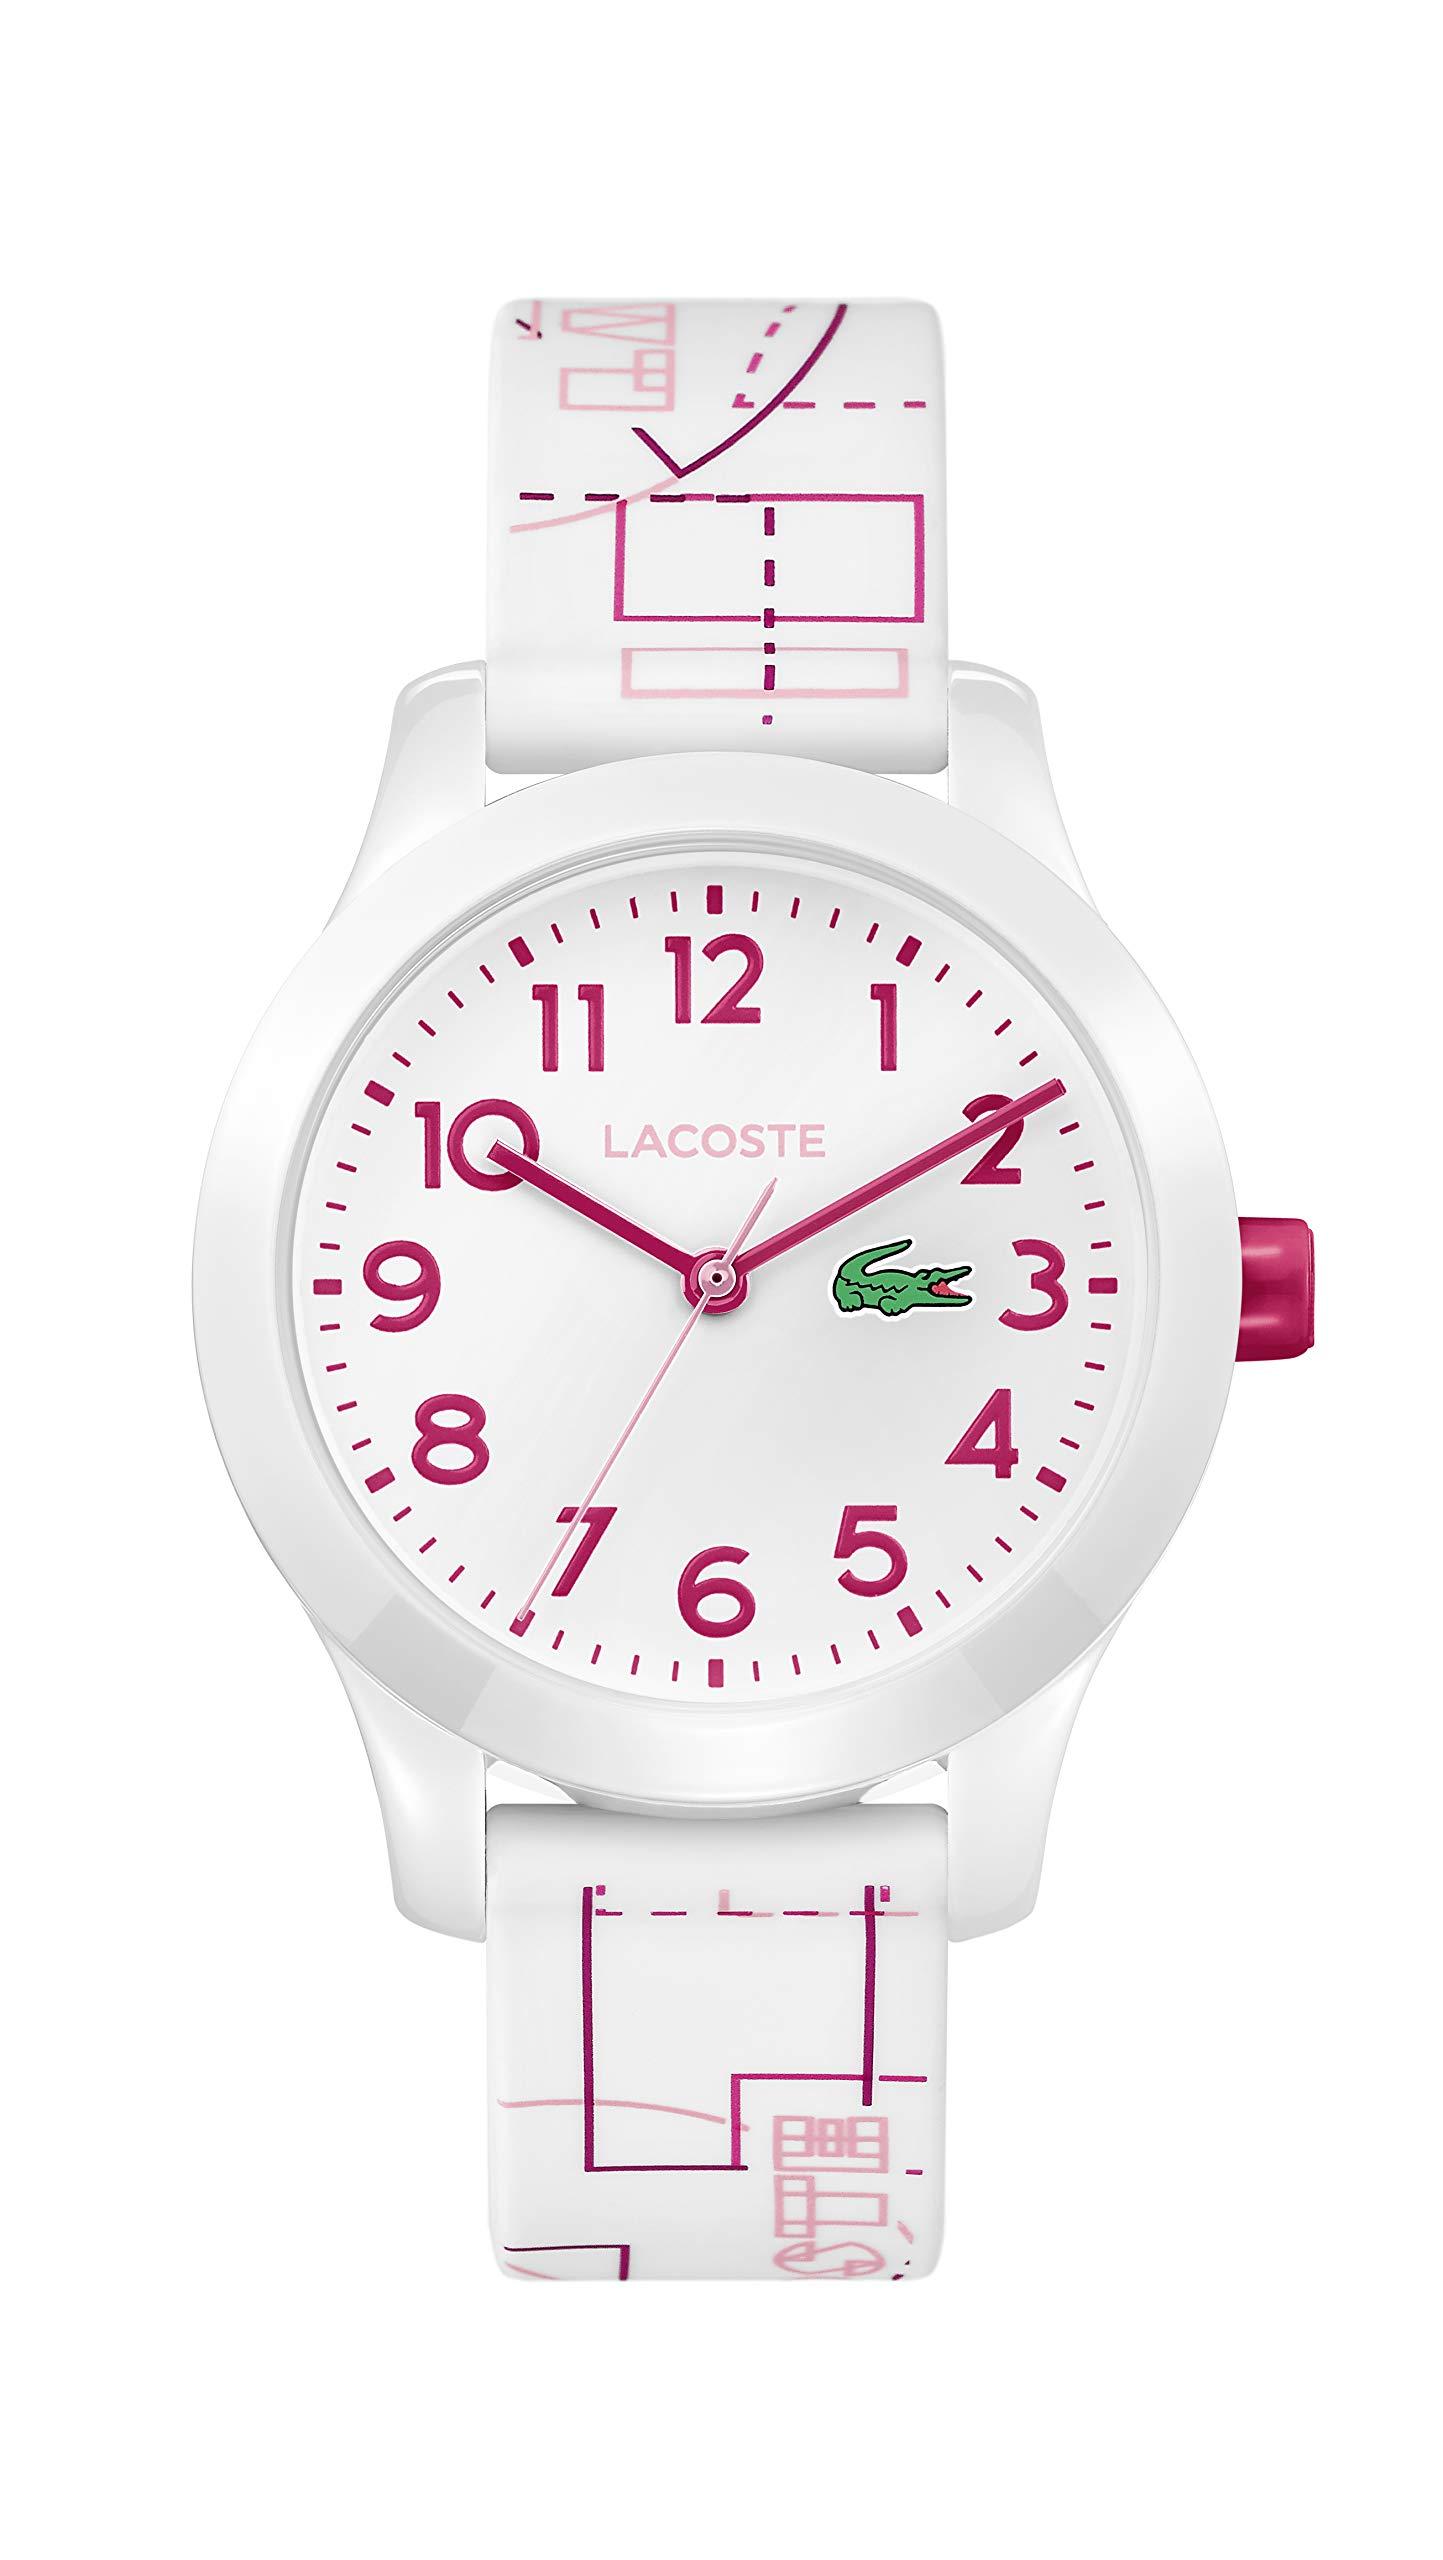 Lacoste Kids Lacoste.12.12 Kids Quartz TR-90 and Rubber Strap Casual Watch, Color: White (Model: 2030009)